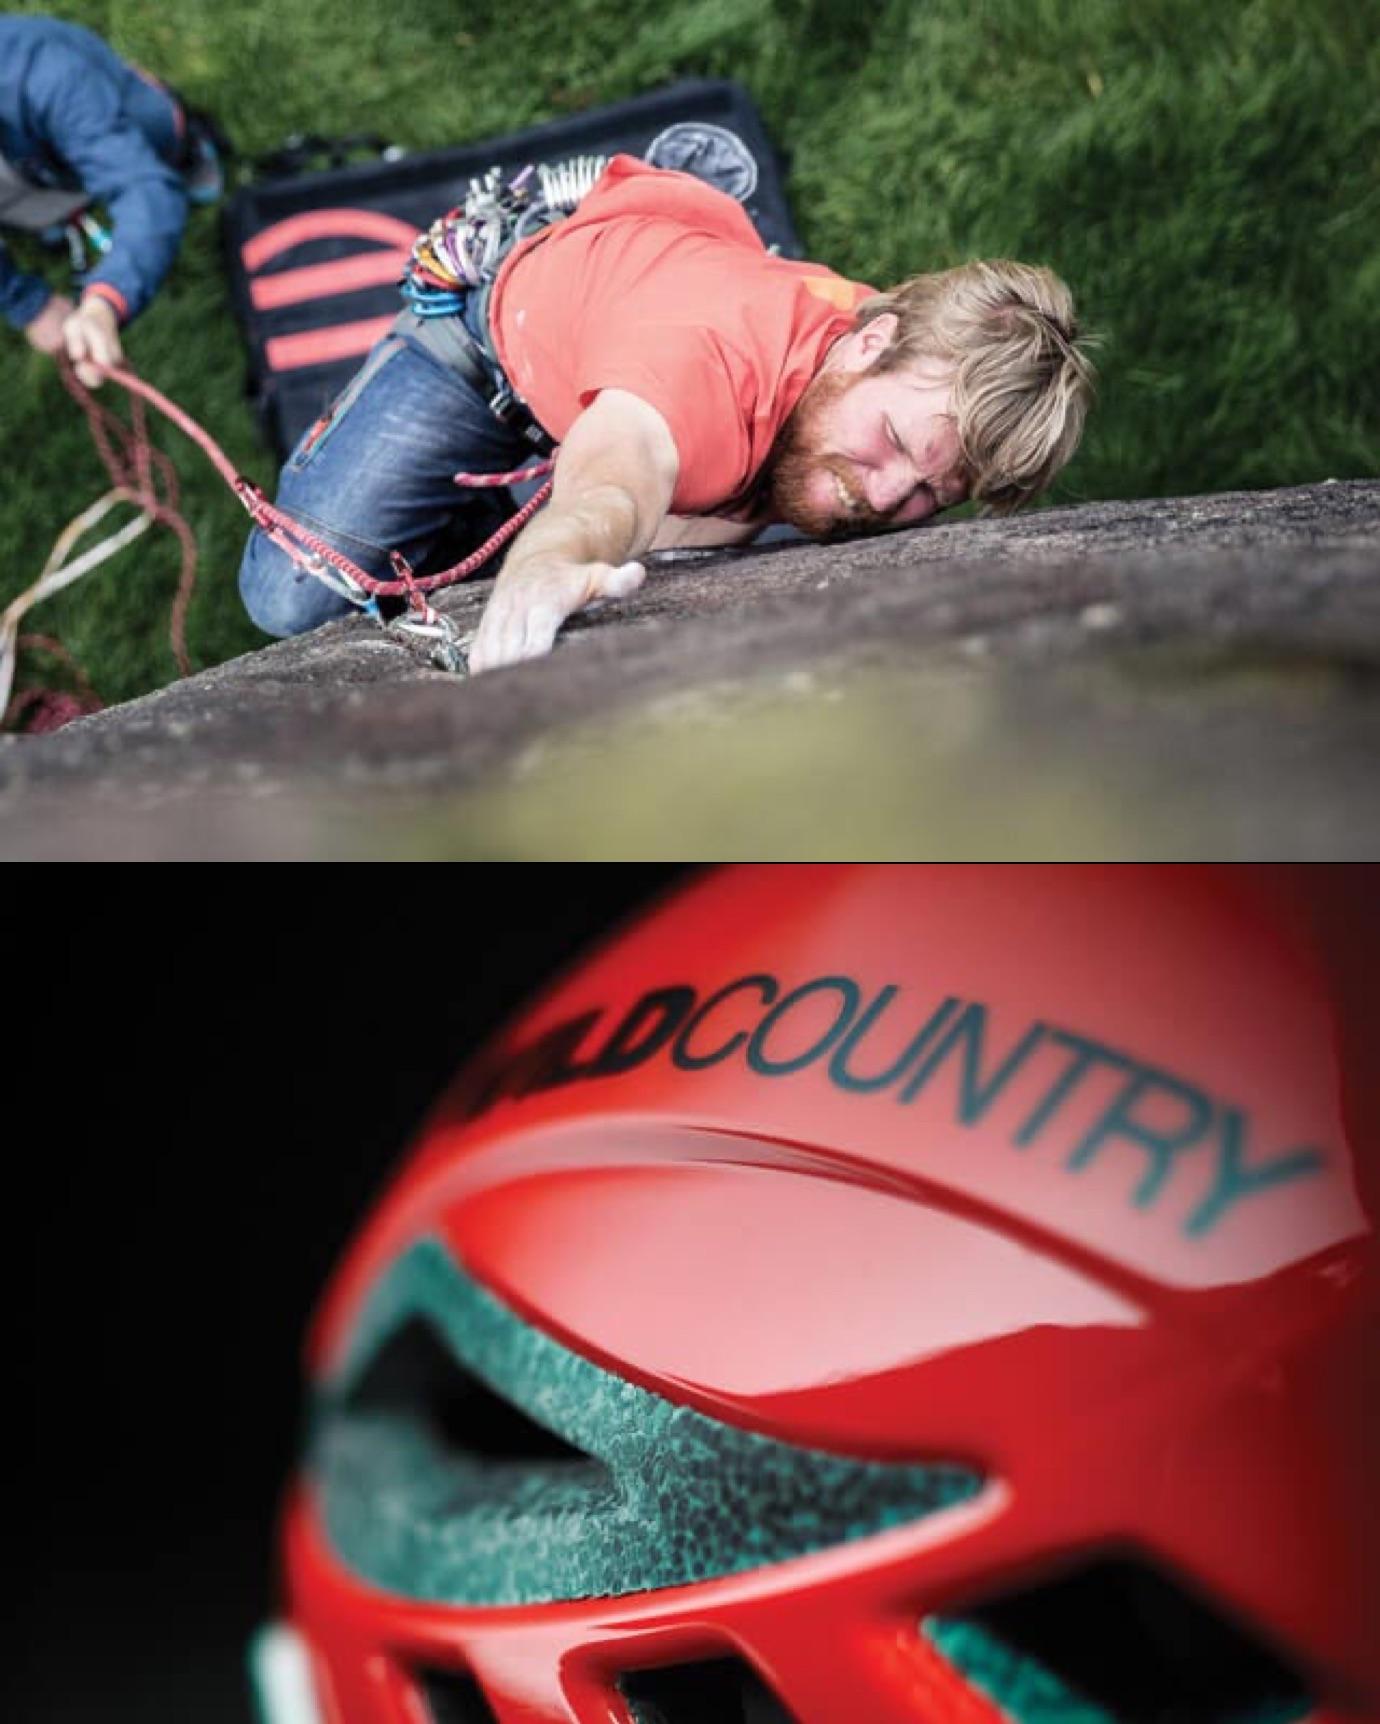 Climber on a rock & a helmet closeup